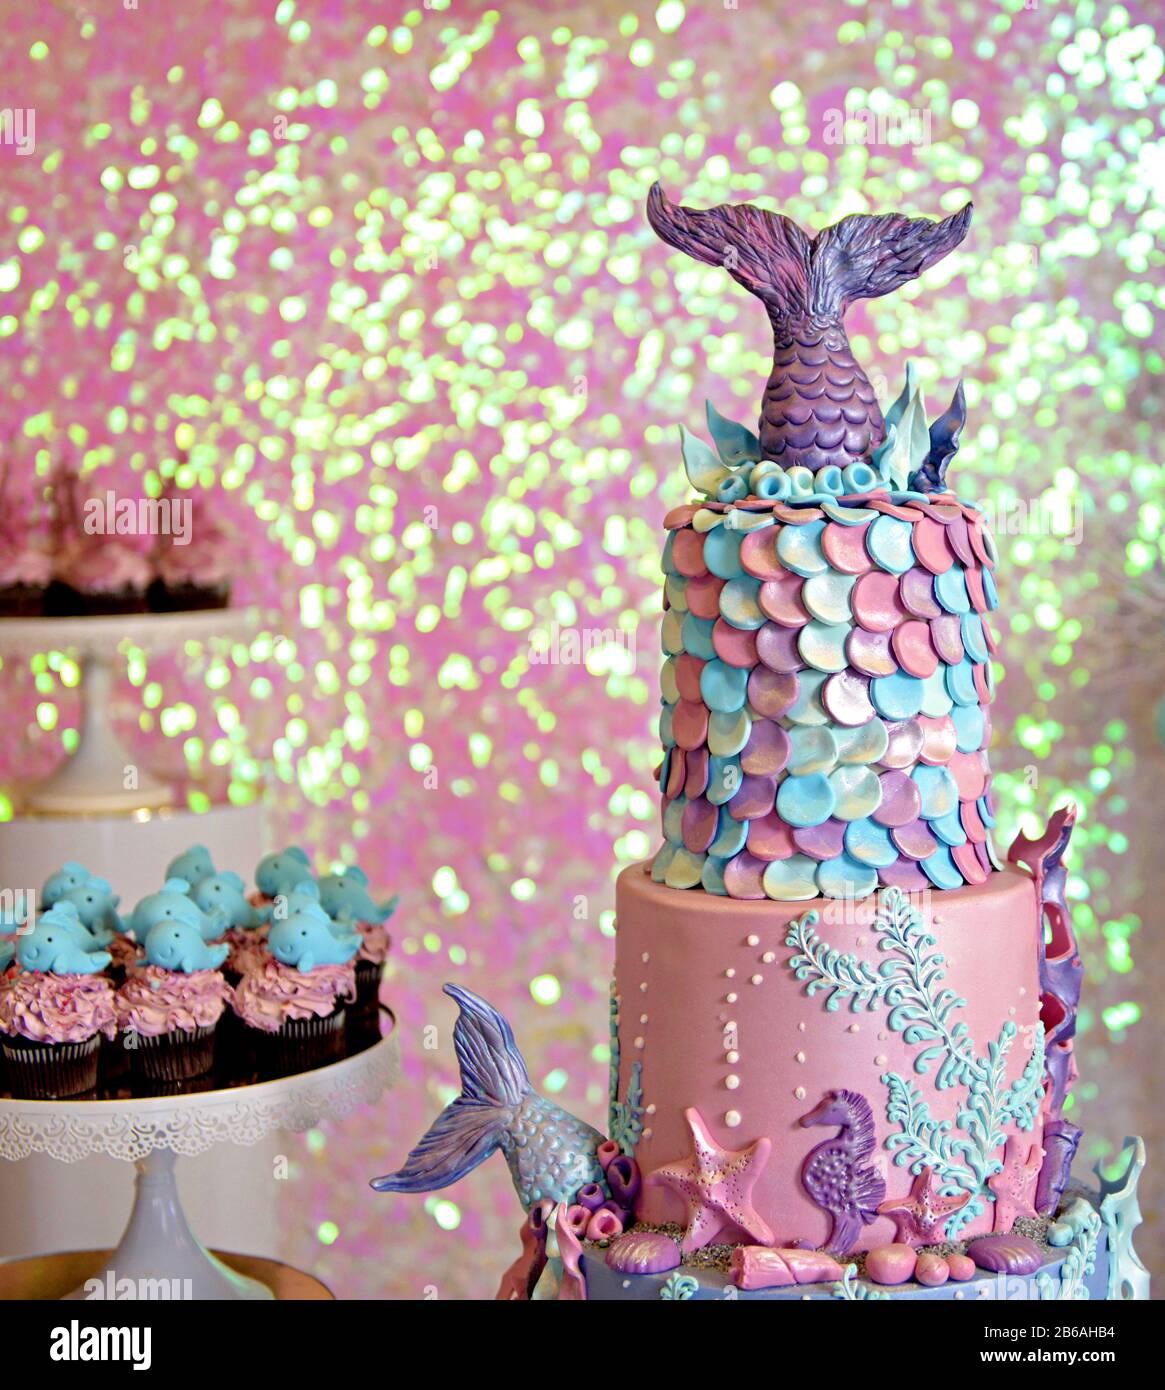 Wondrous Baby Girl Genuine Birthday Cake Sea Life Theme Image Stock Photo Birthday Cards Printable Trancafe Filternl